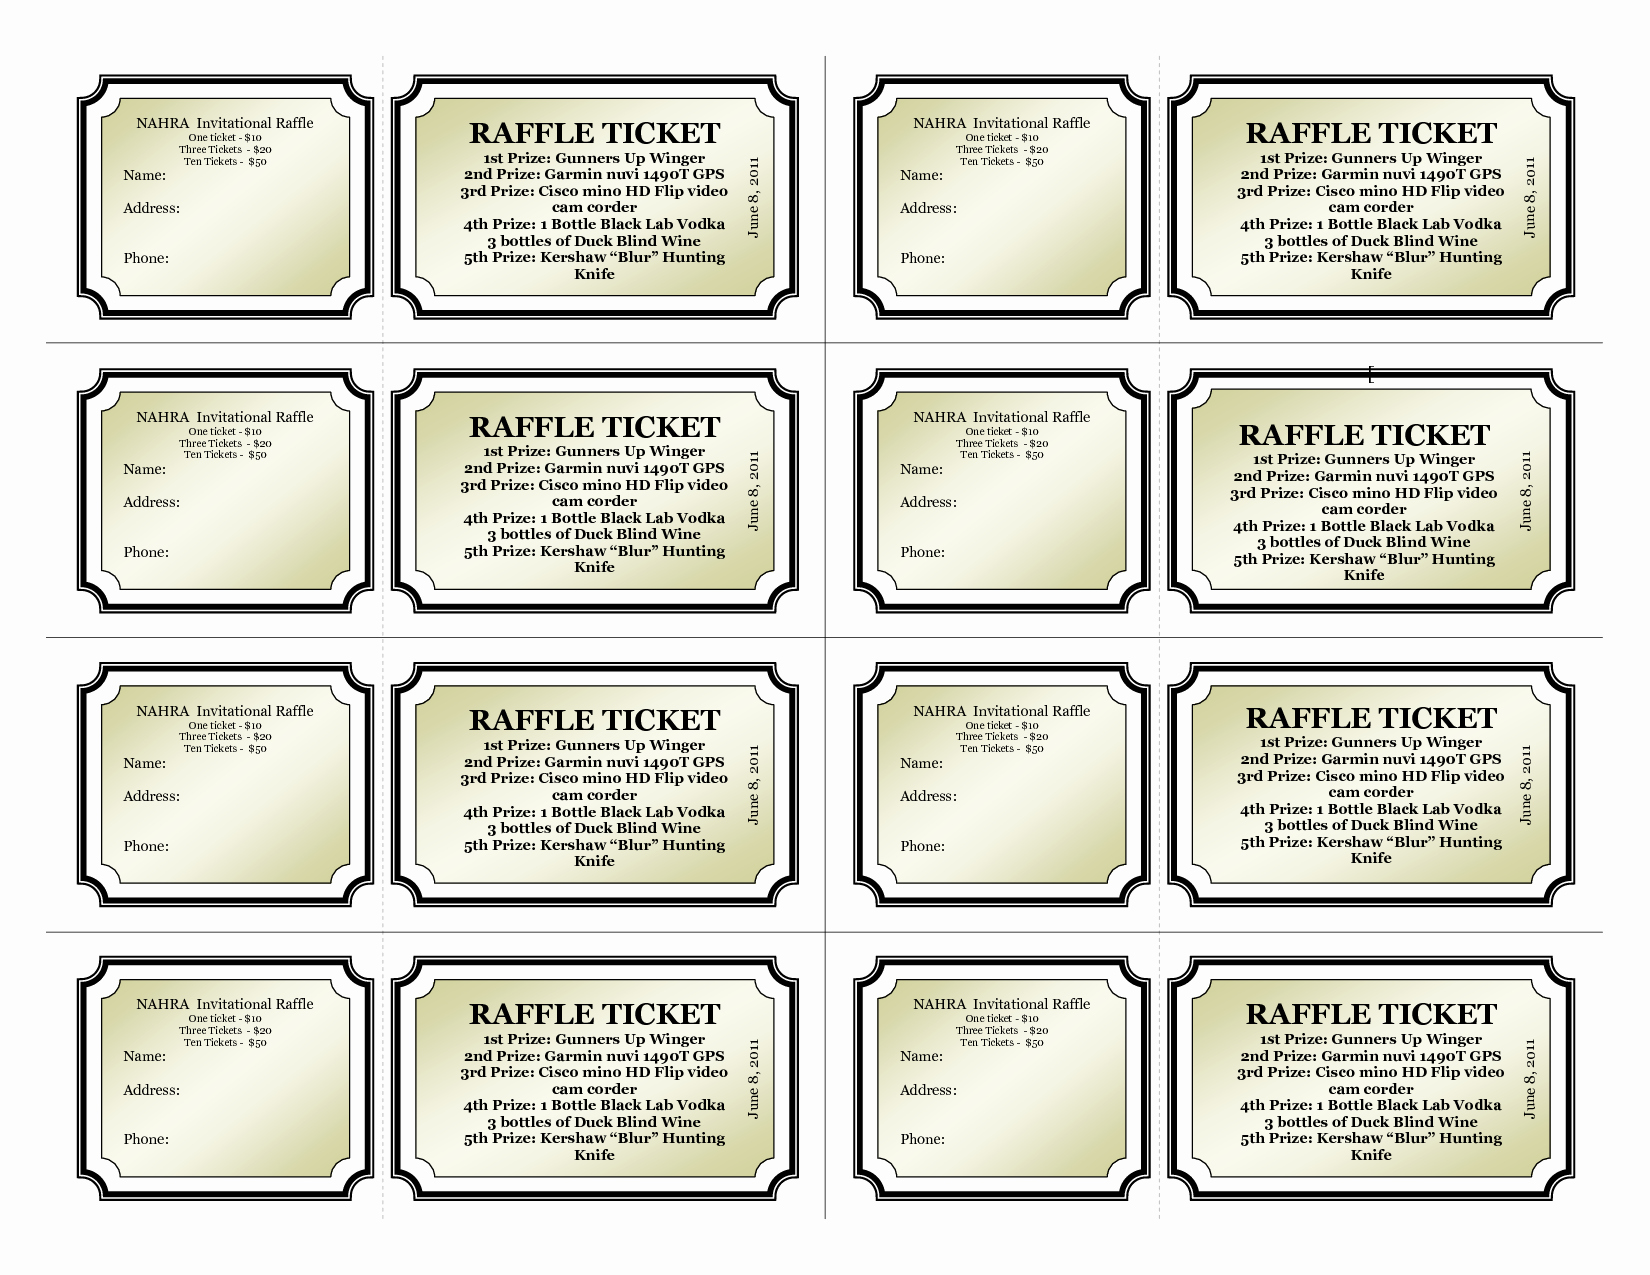 Raffle Ticket Printing Free Template Elegant Free Printable Raffle Tickets Template Bamboodownunder